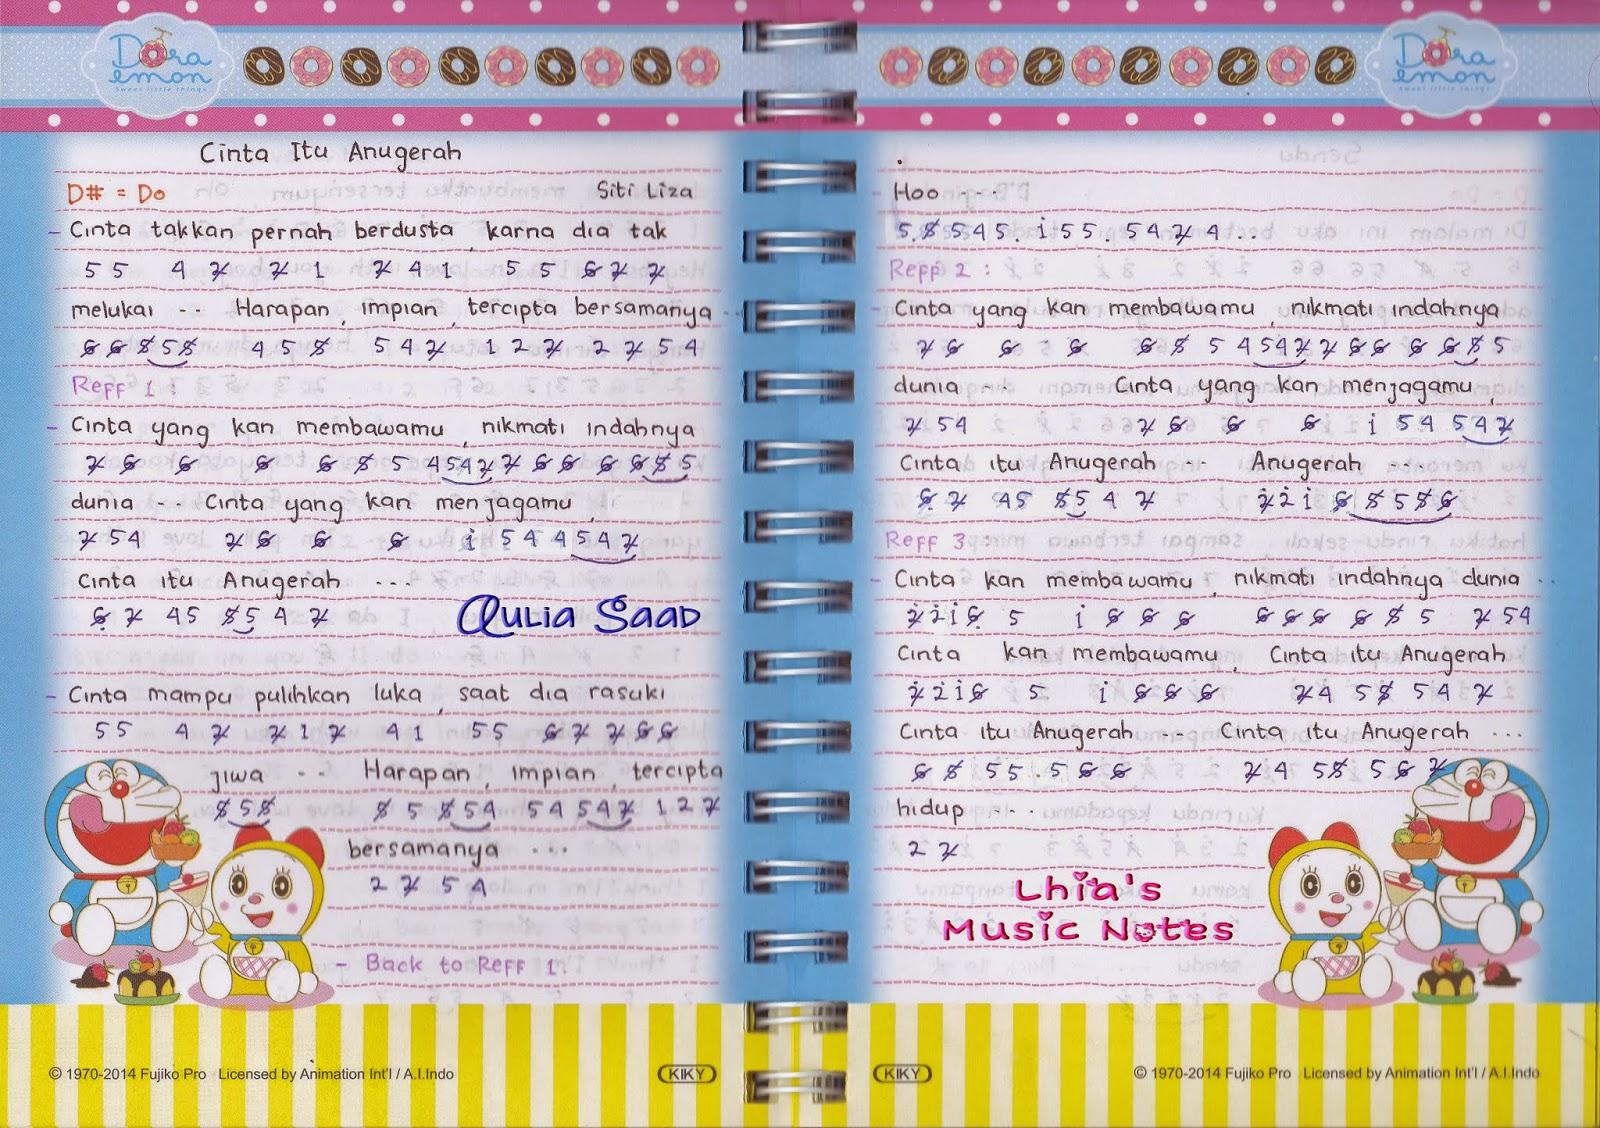 Chord Gitar Lagu Sheila On 7 Jap | apexwallpapers.com